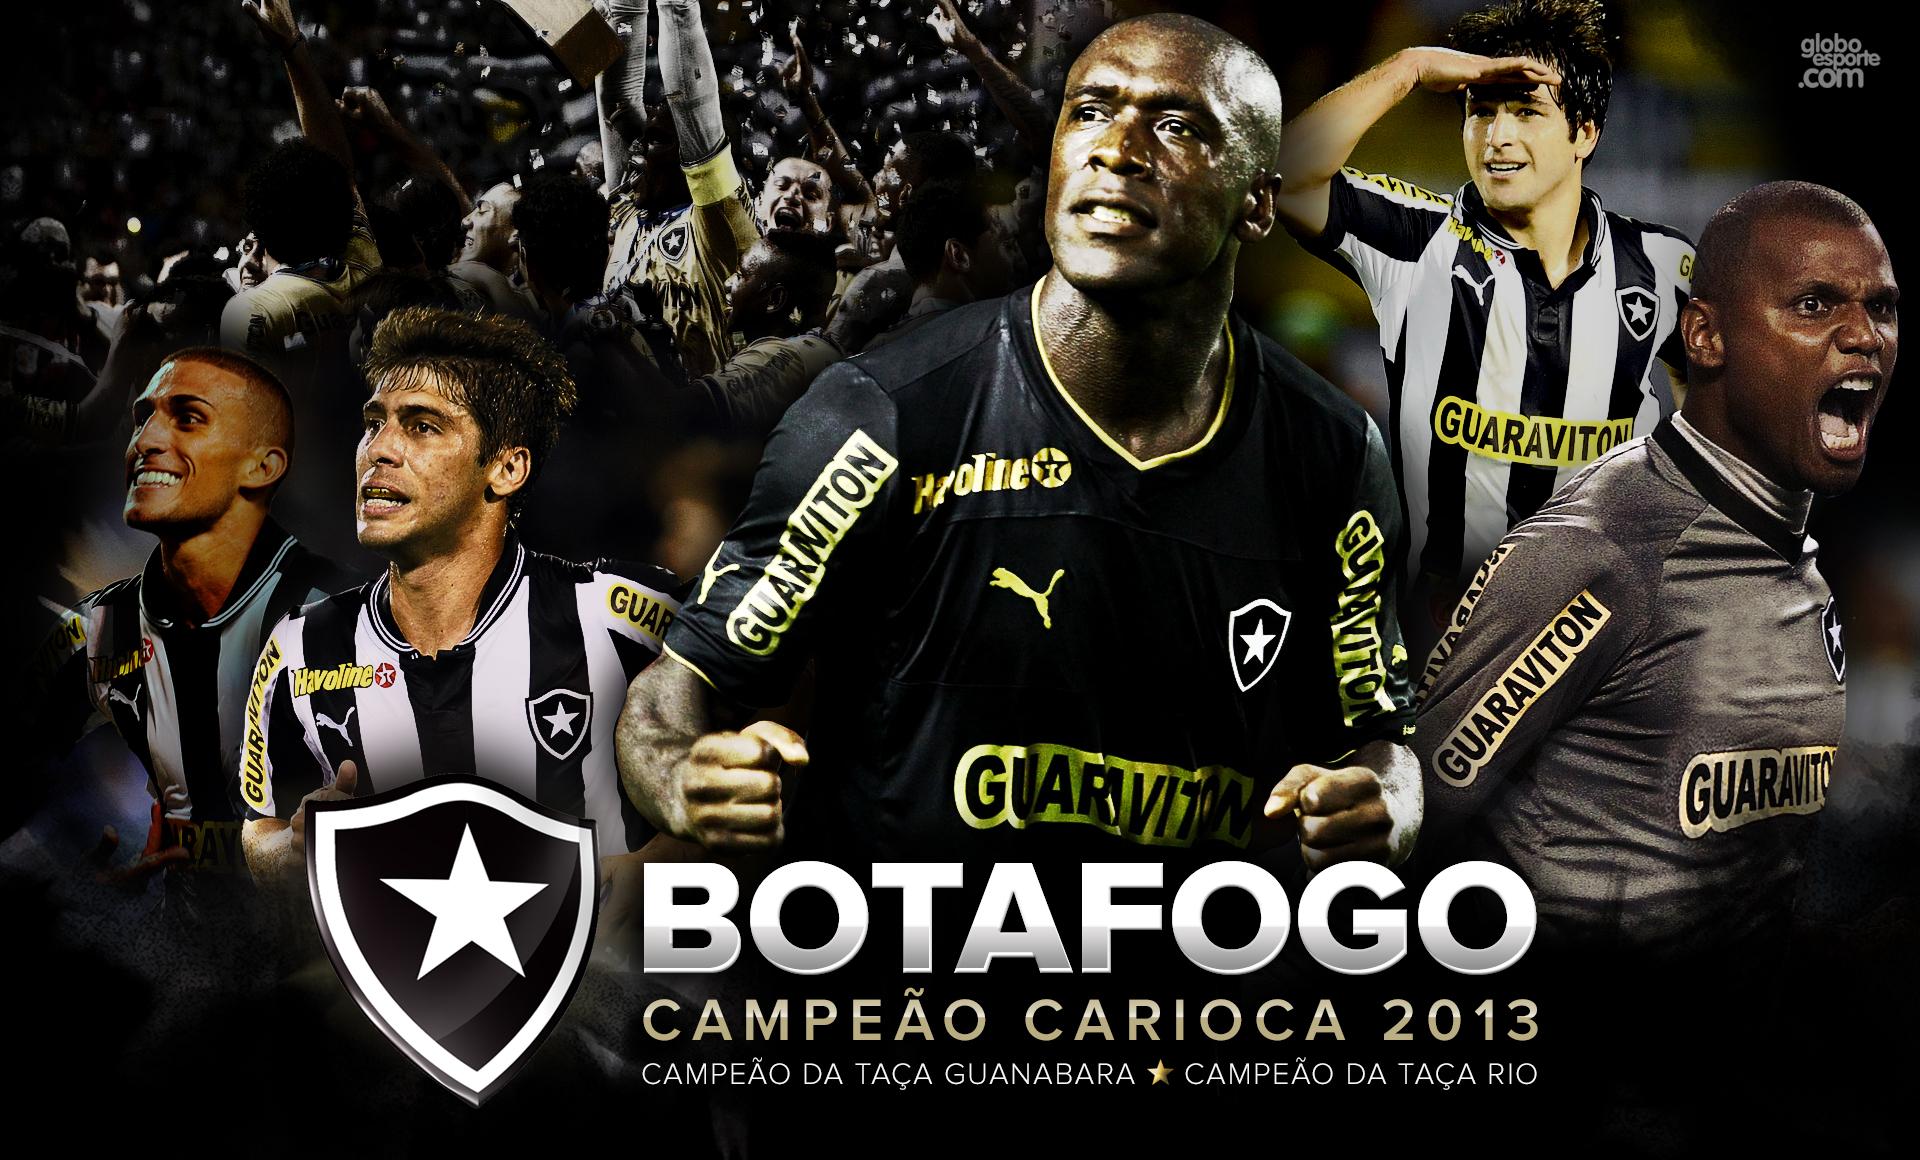 Botafogo Football Wallpaper 1920x1160